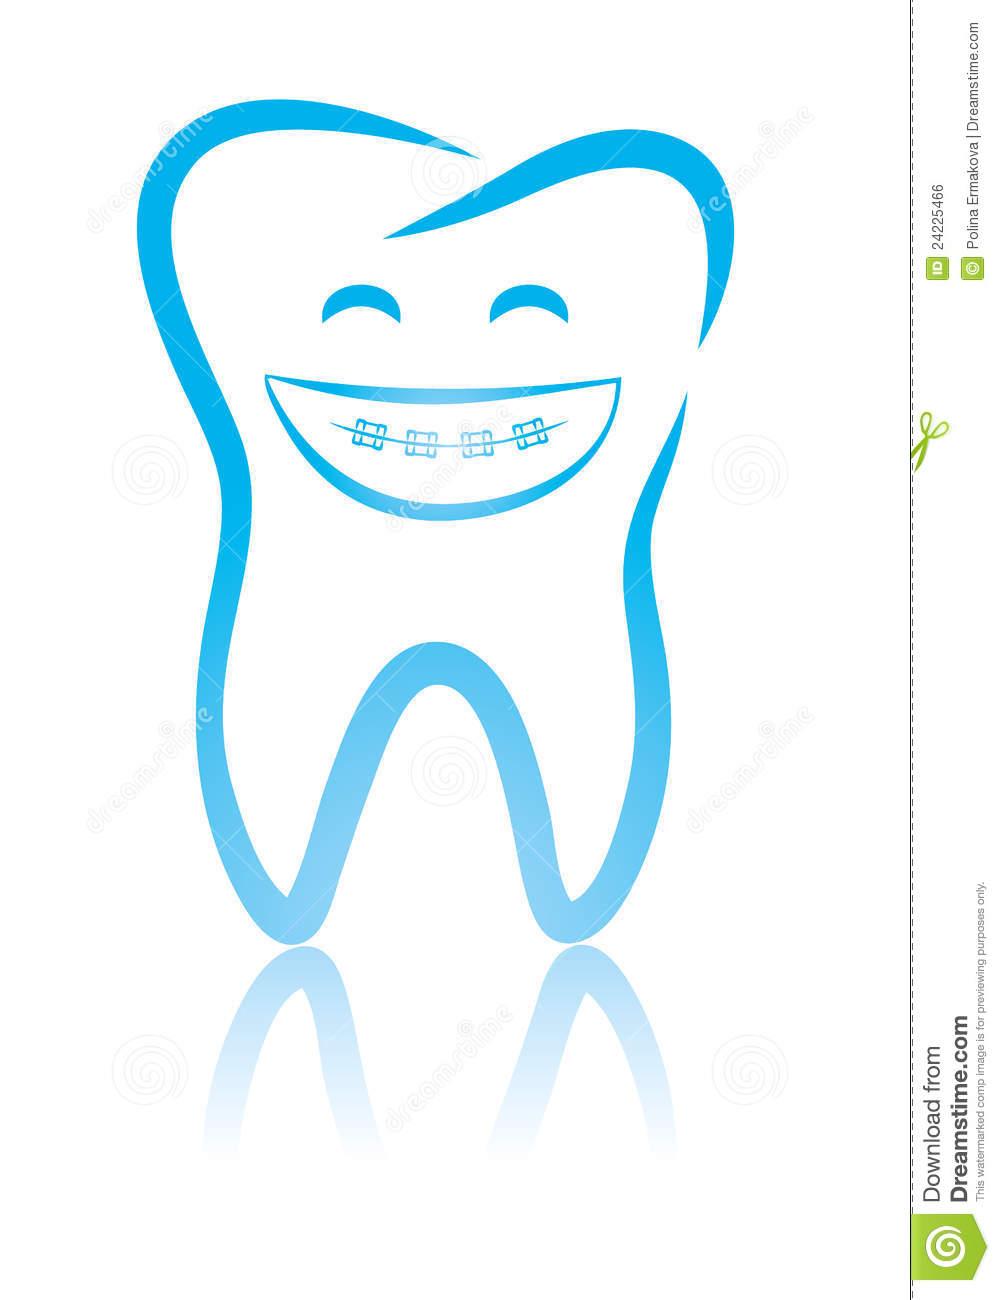 Teeth clipart symbol Teeth dental Teeth braces teeth